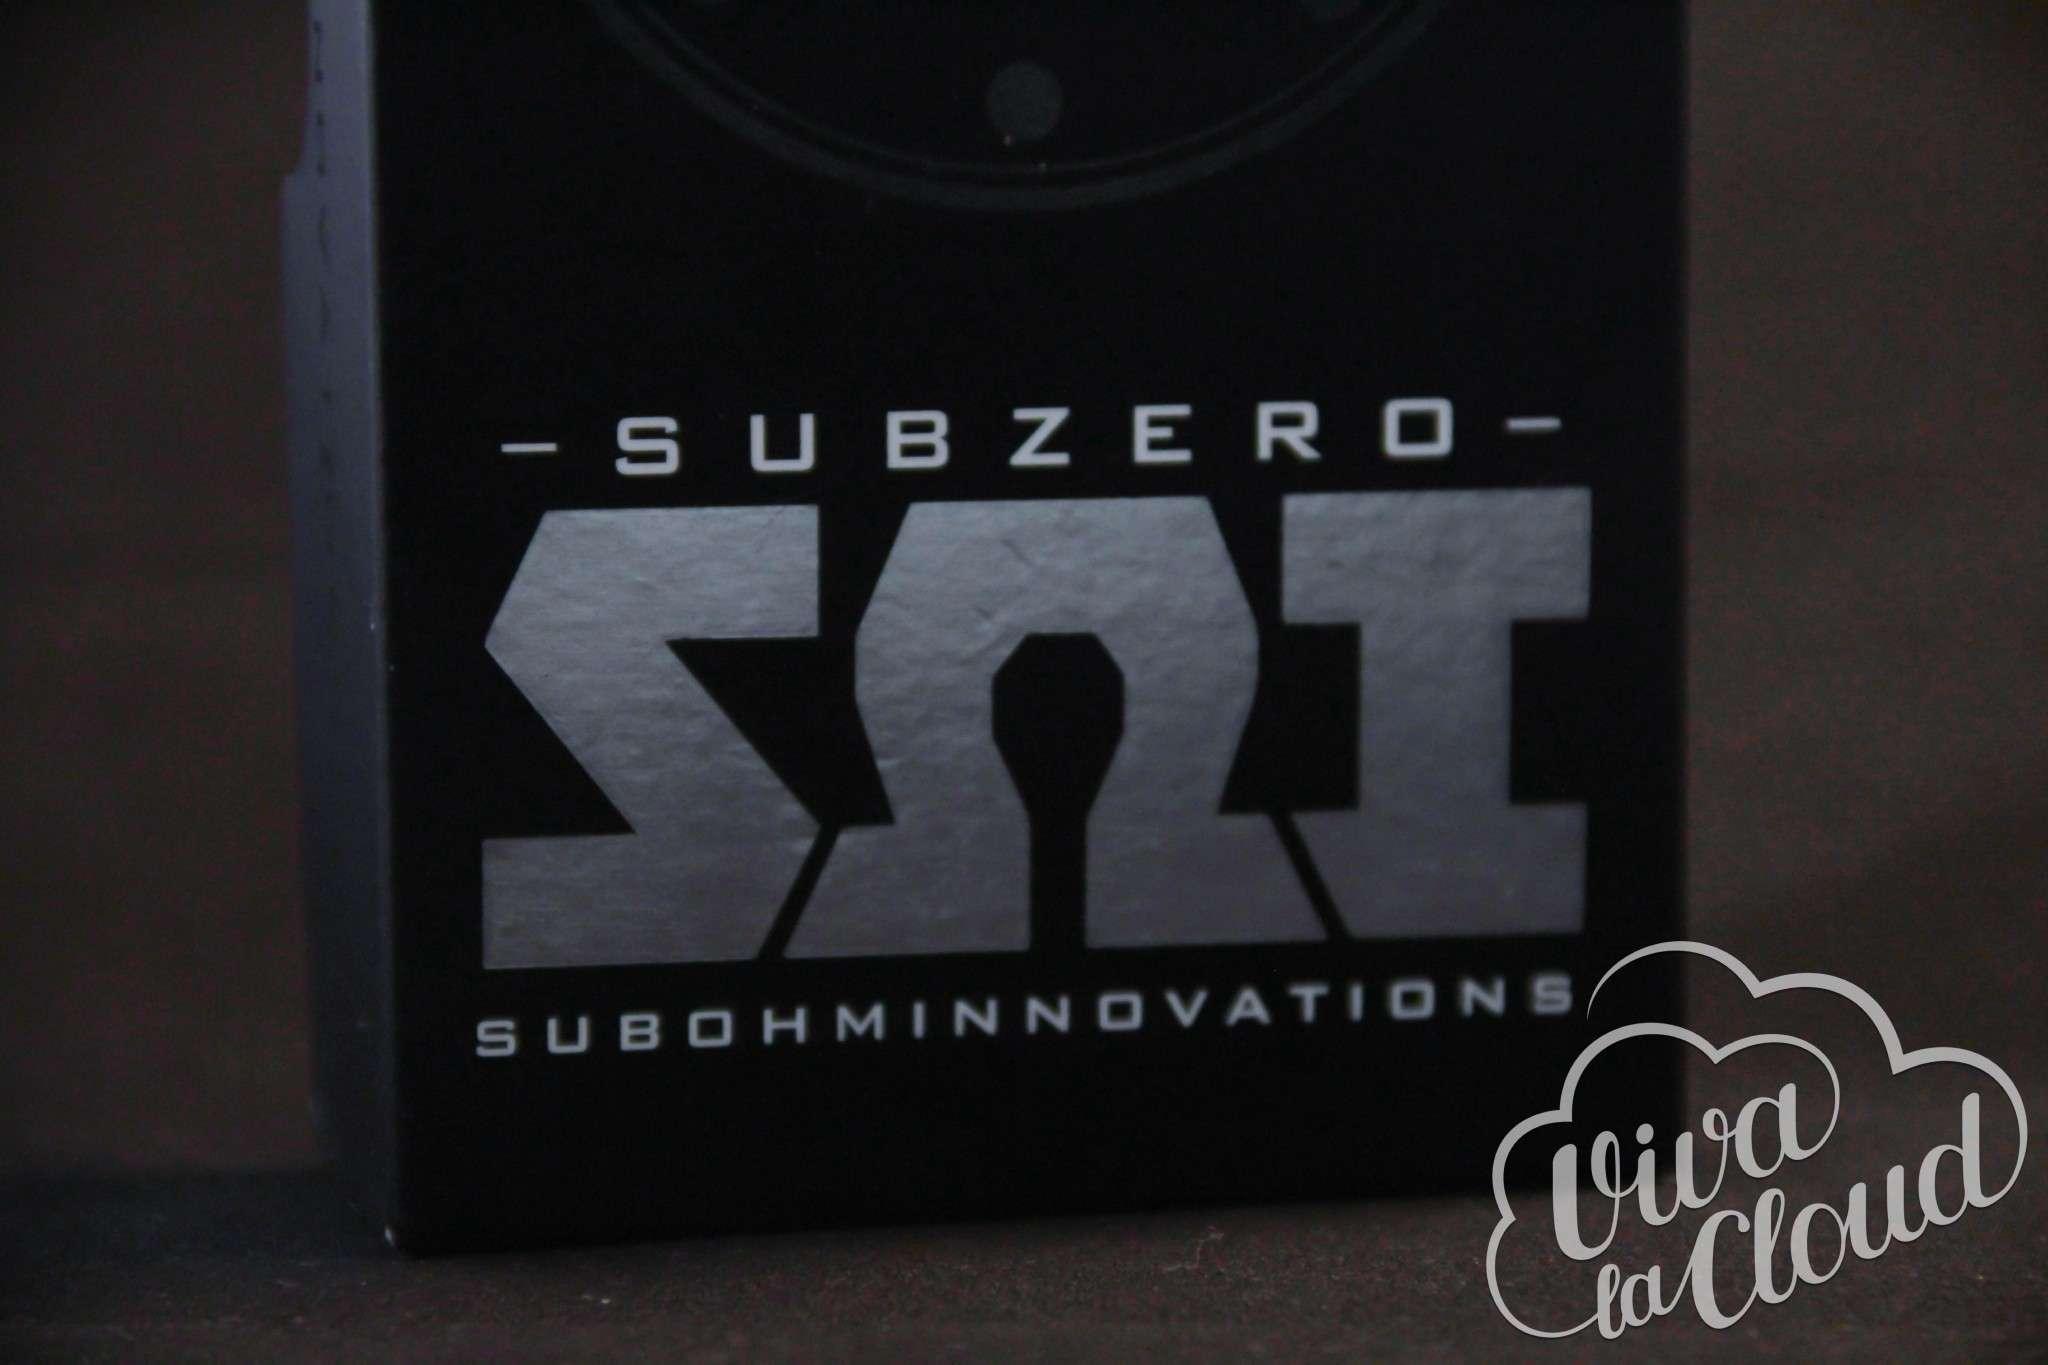 Subzero SUB OHM INNOVATION